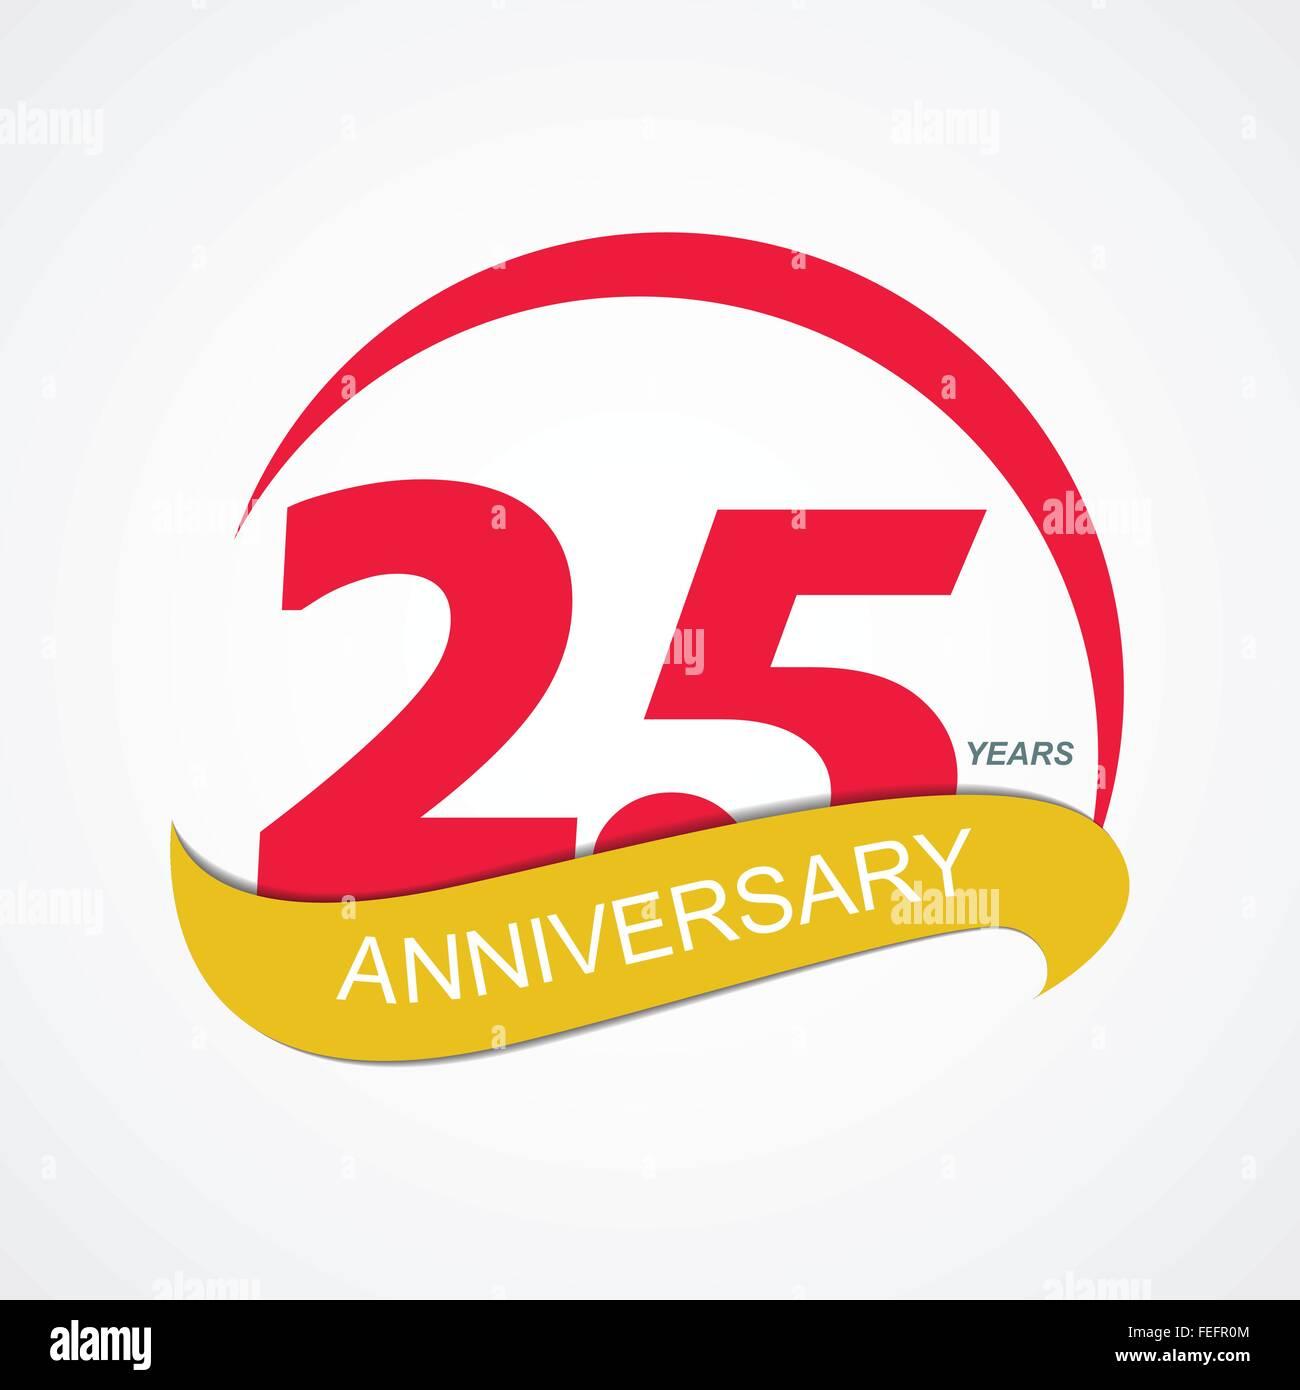 template logo 25 anniversary vector illustration stock vector art rh alamy com 25 years logo vector 25 years logo png